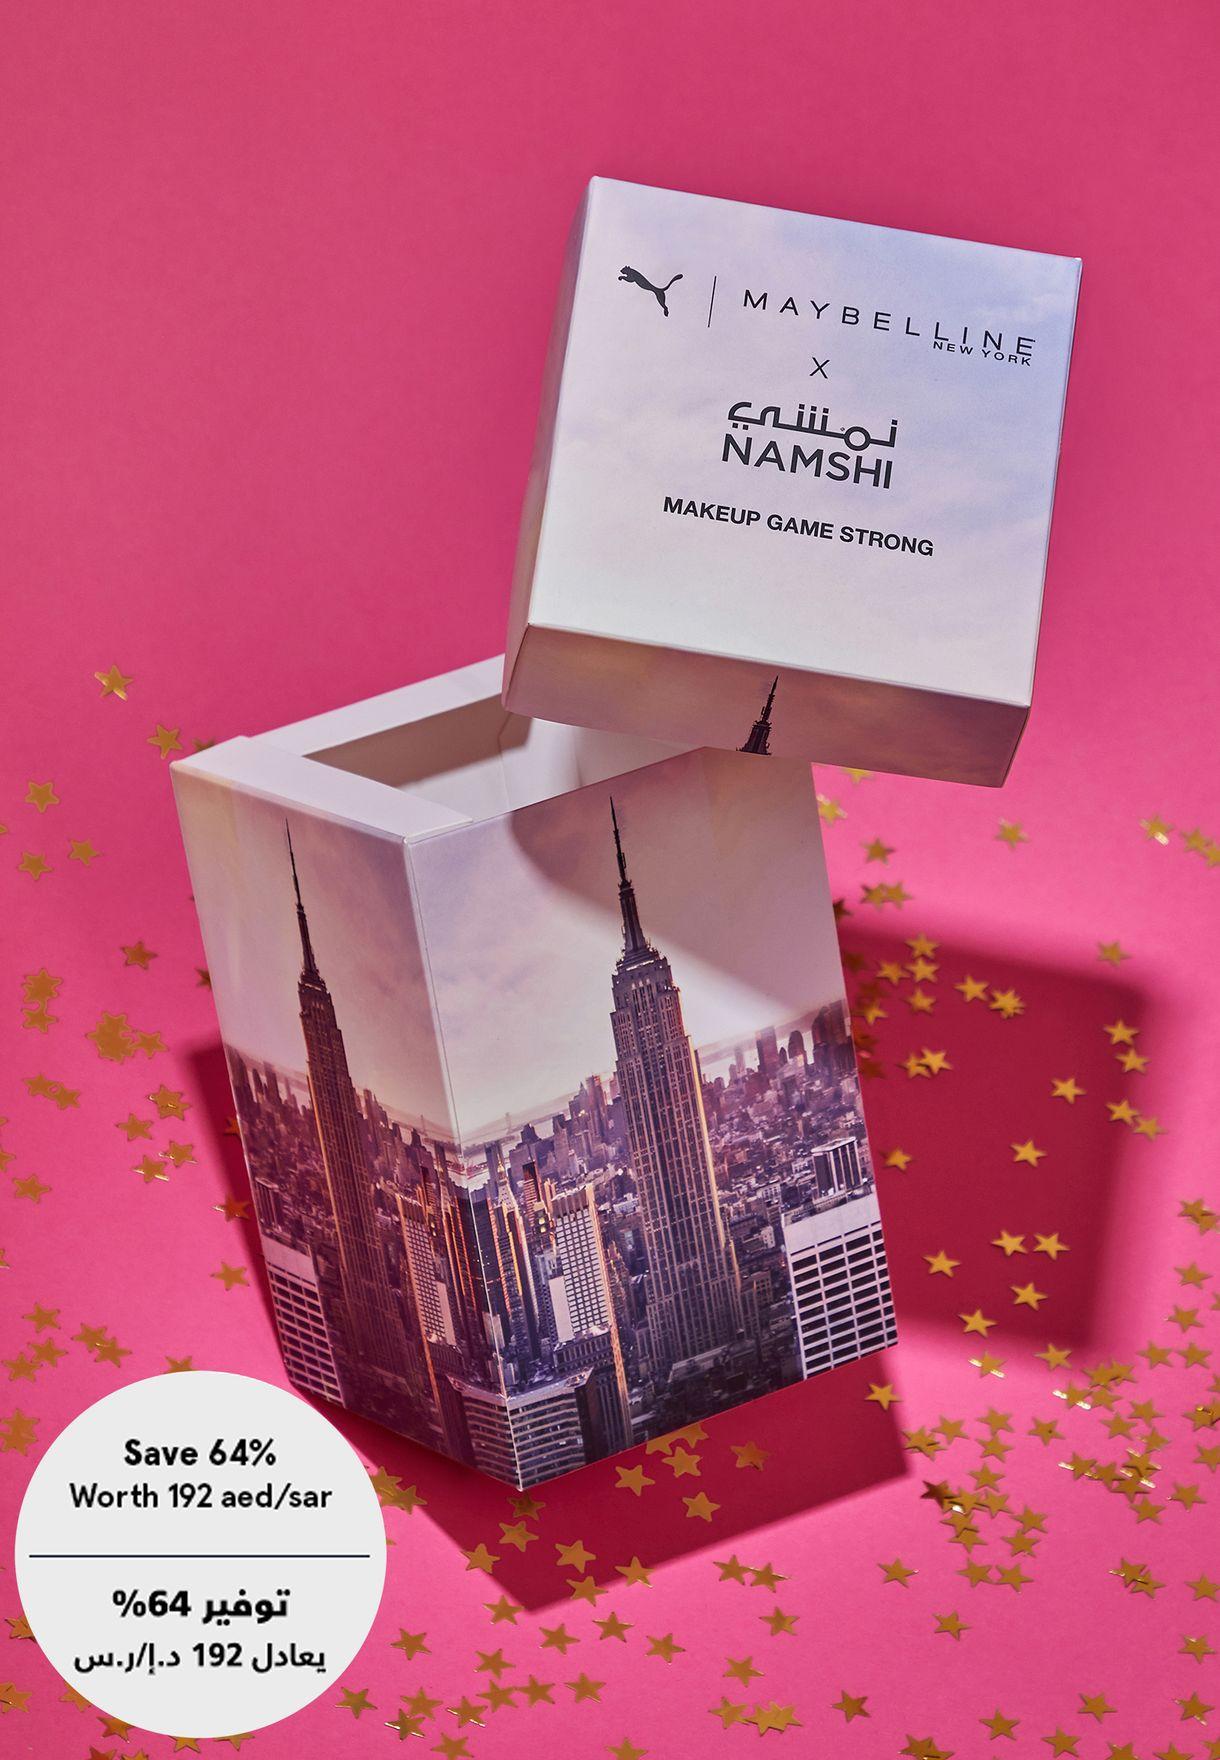 Puma X Maybelline Makeup Mystery Box Saving 40%